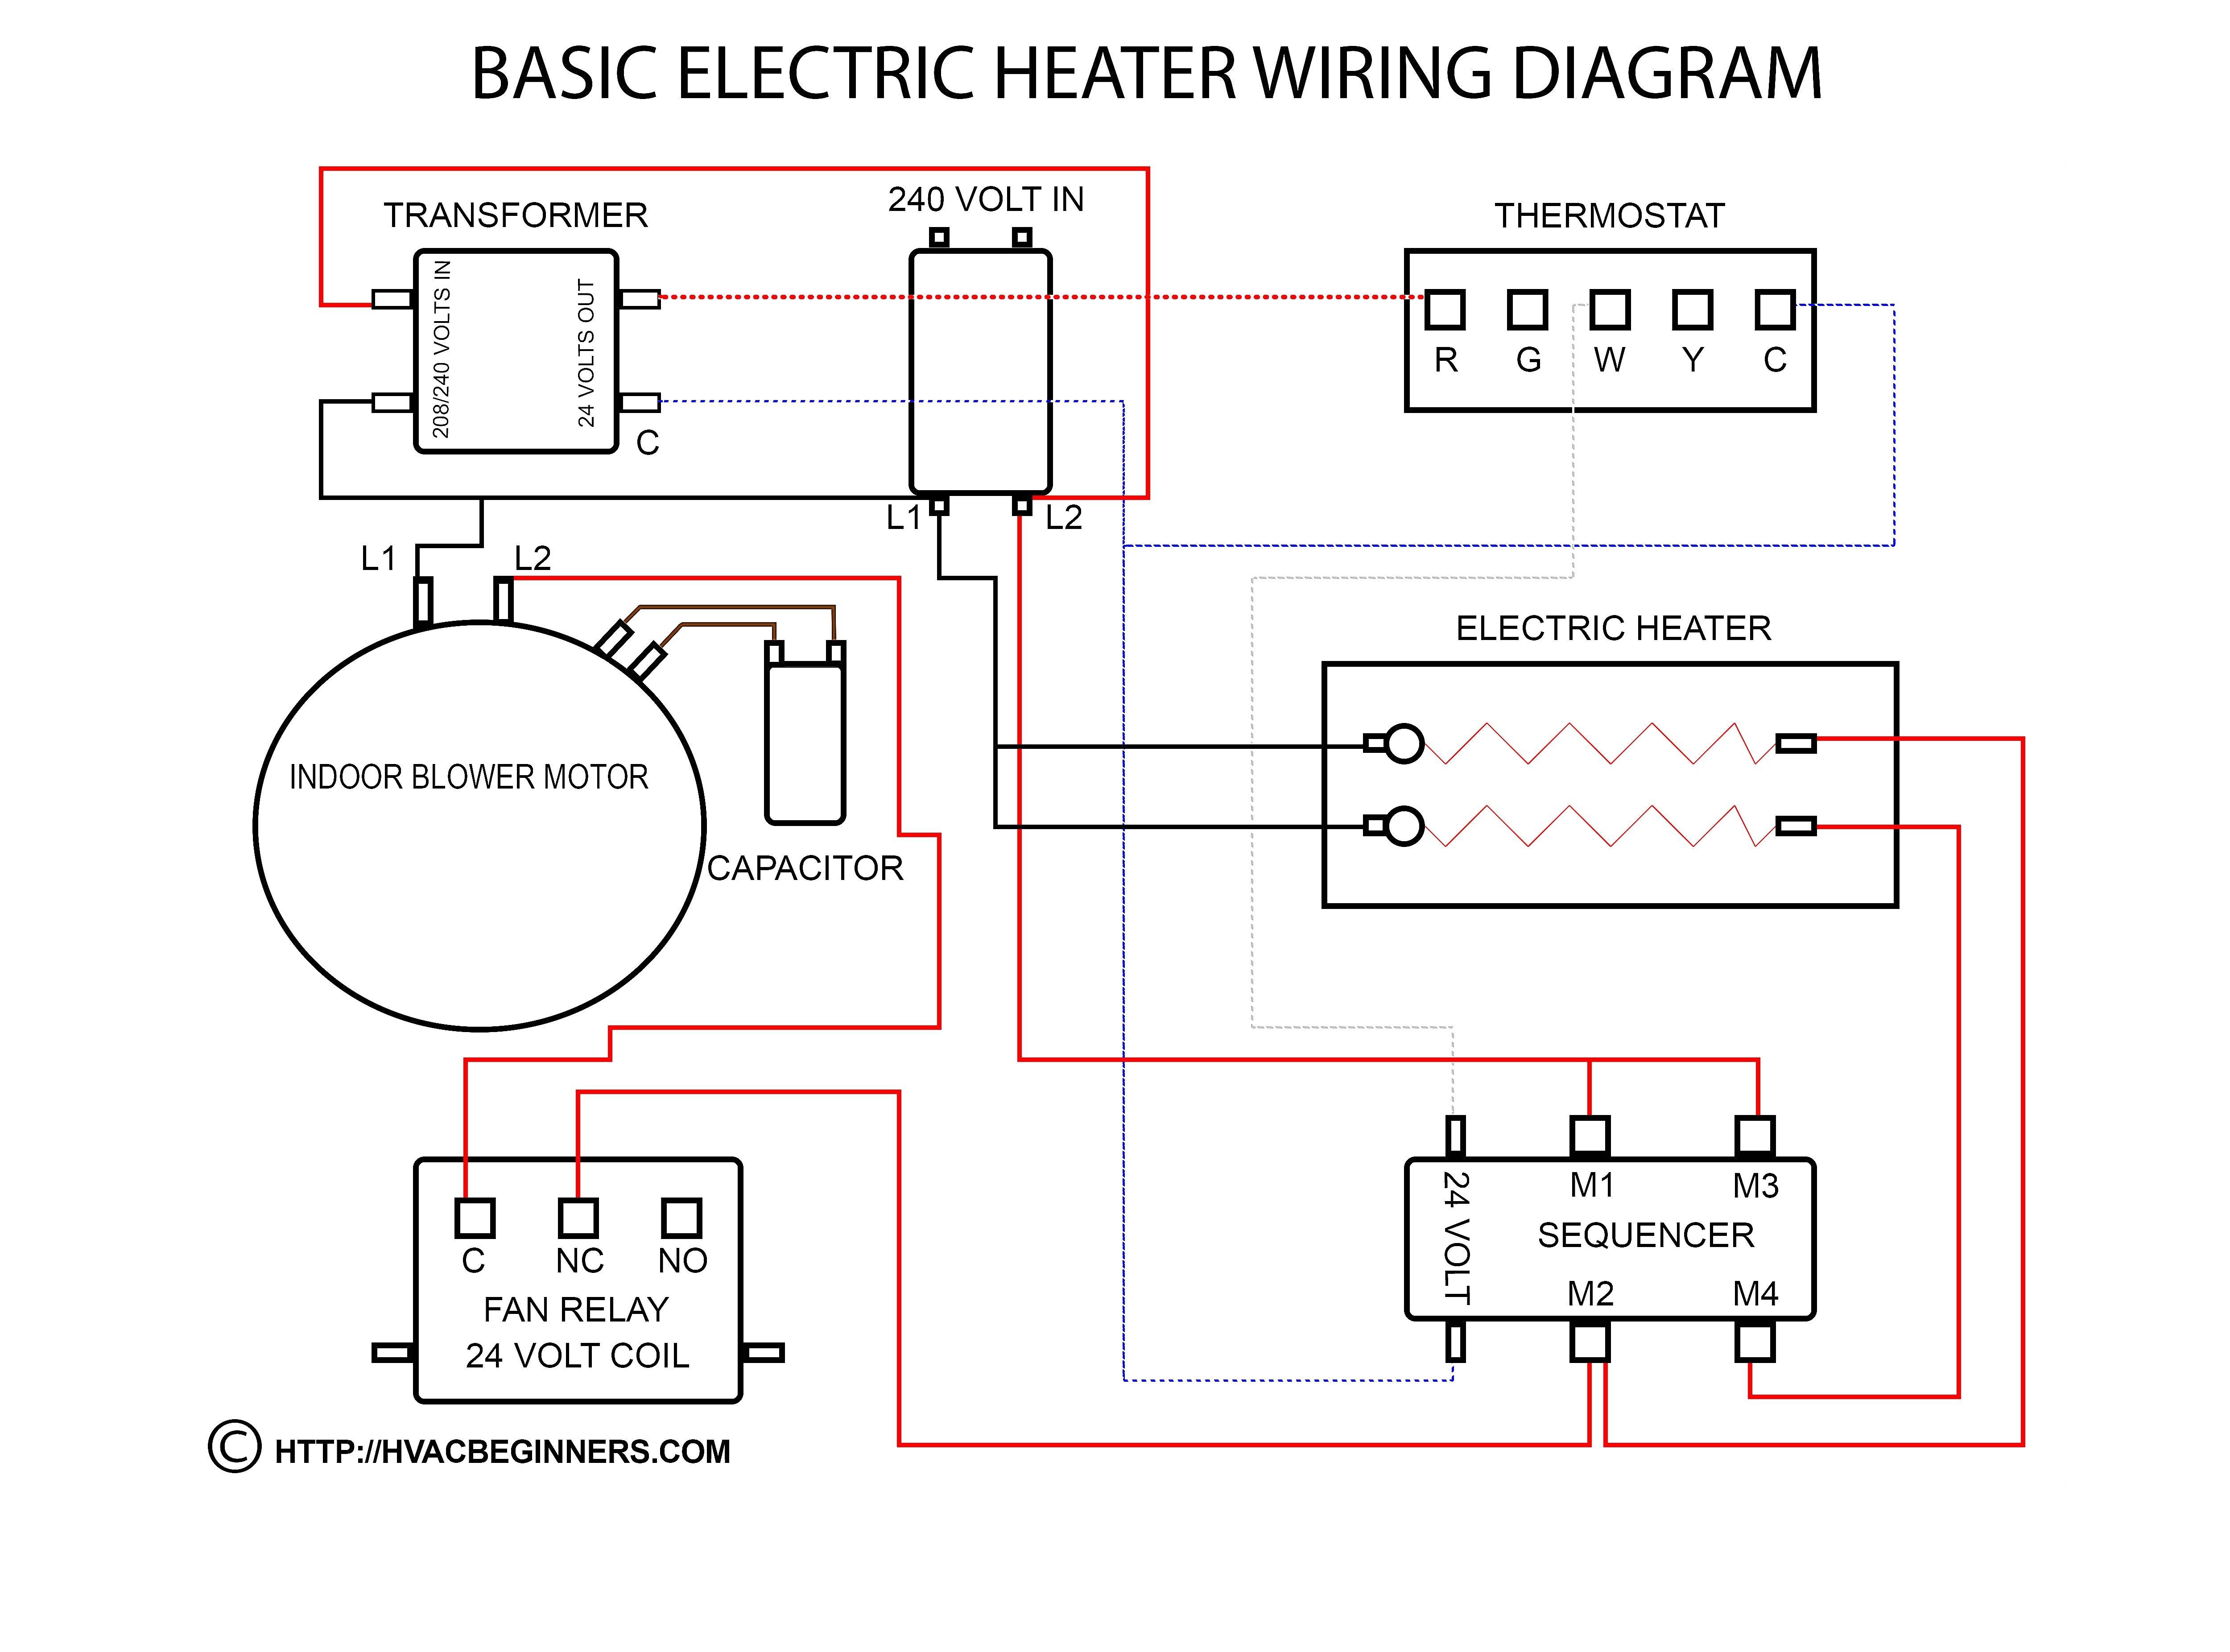 hvac wiring diagram Download-Wiring A Ac Thermostat Diagram New Hvac Wiring Diagram Best Wiring Diagram For Thermostat – Wire 7-s